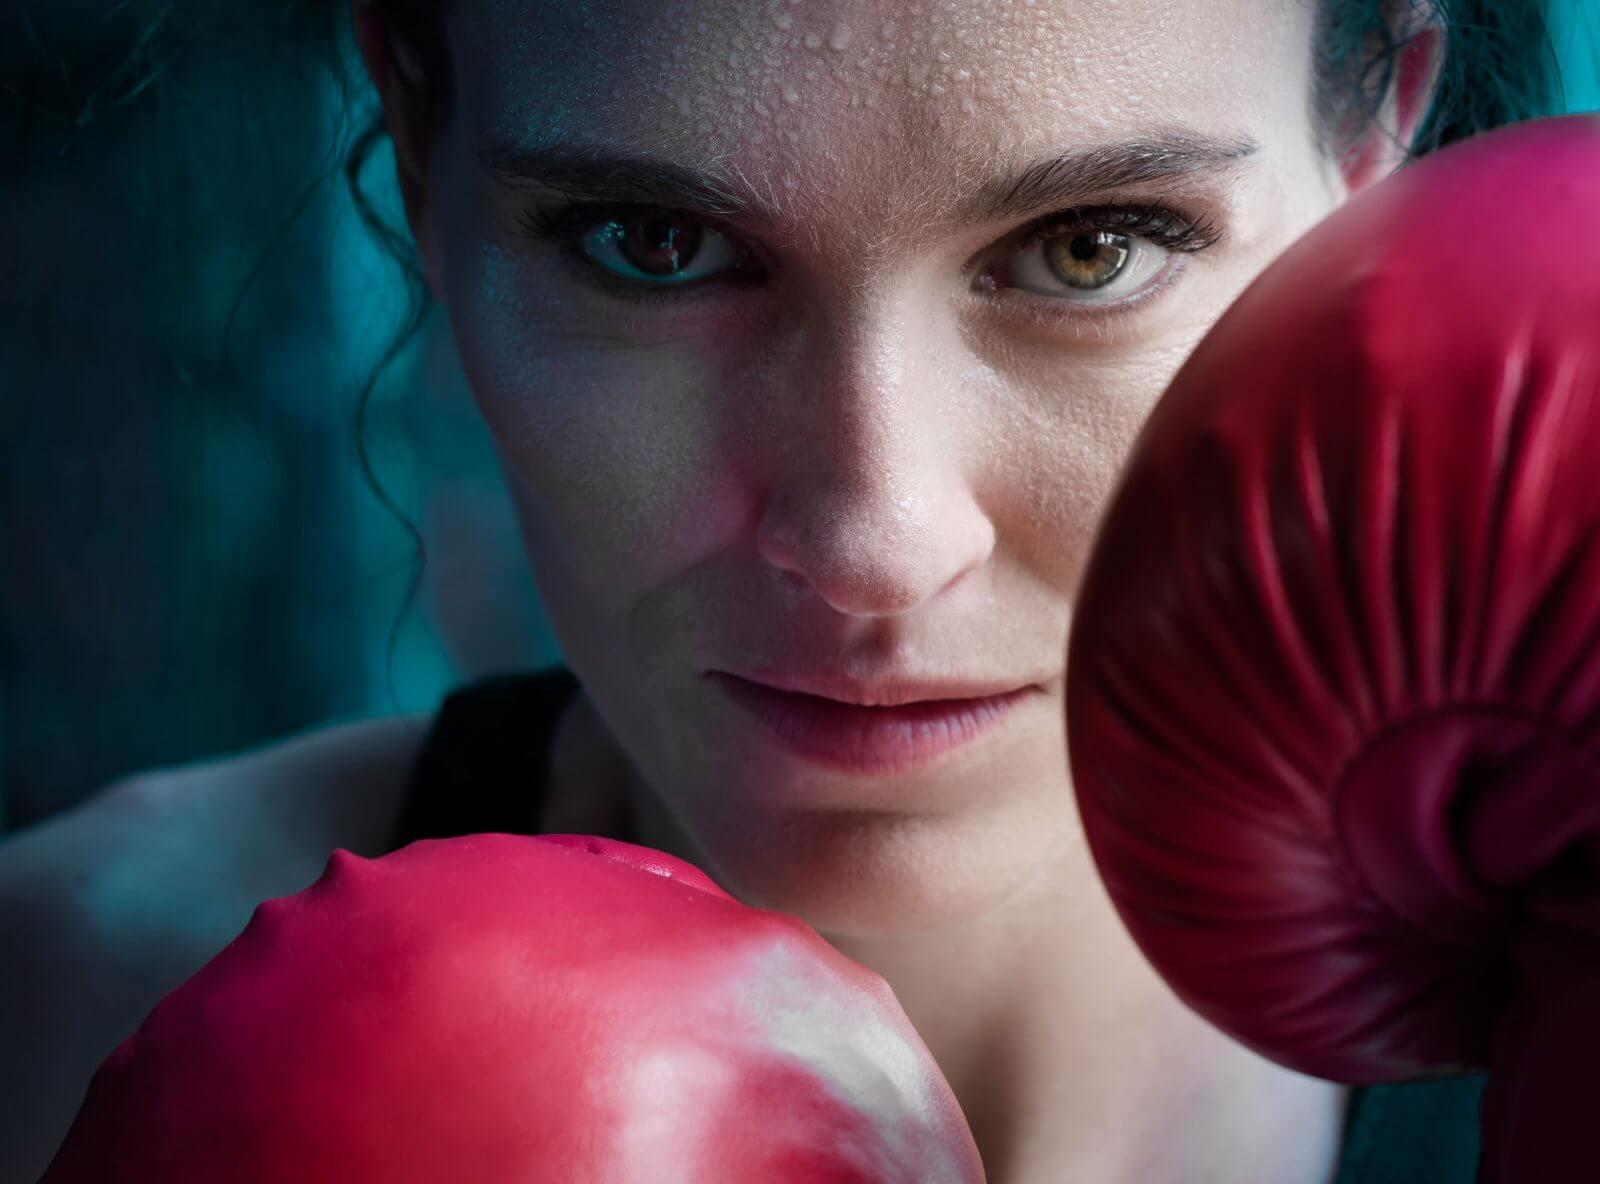 Boxing_Girl